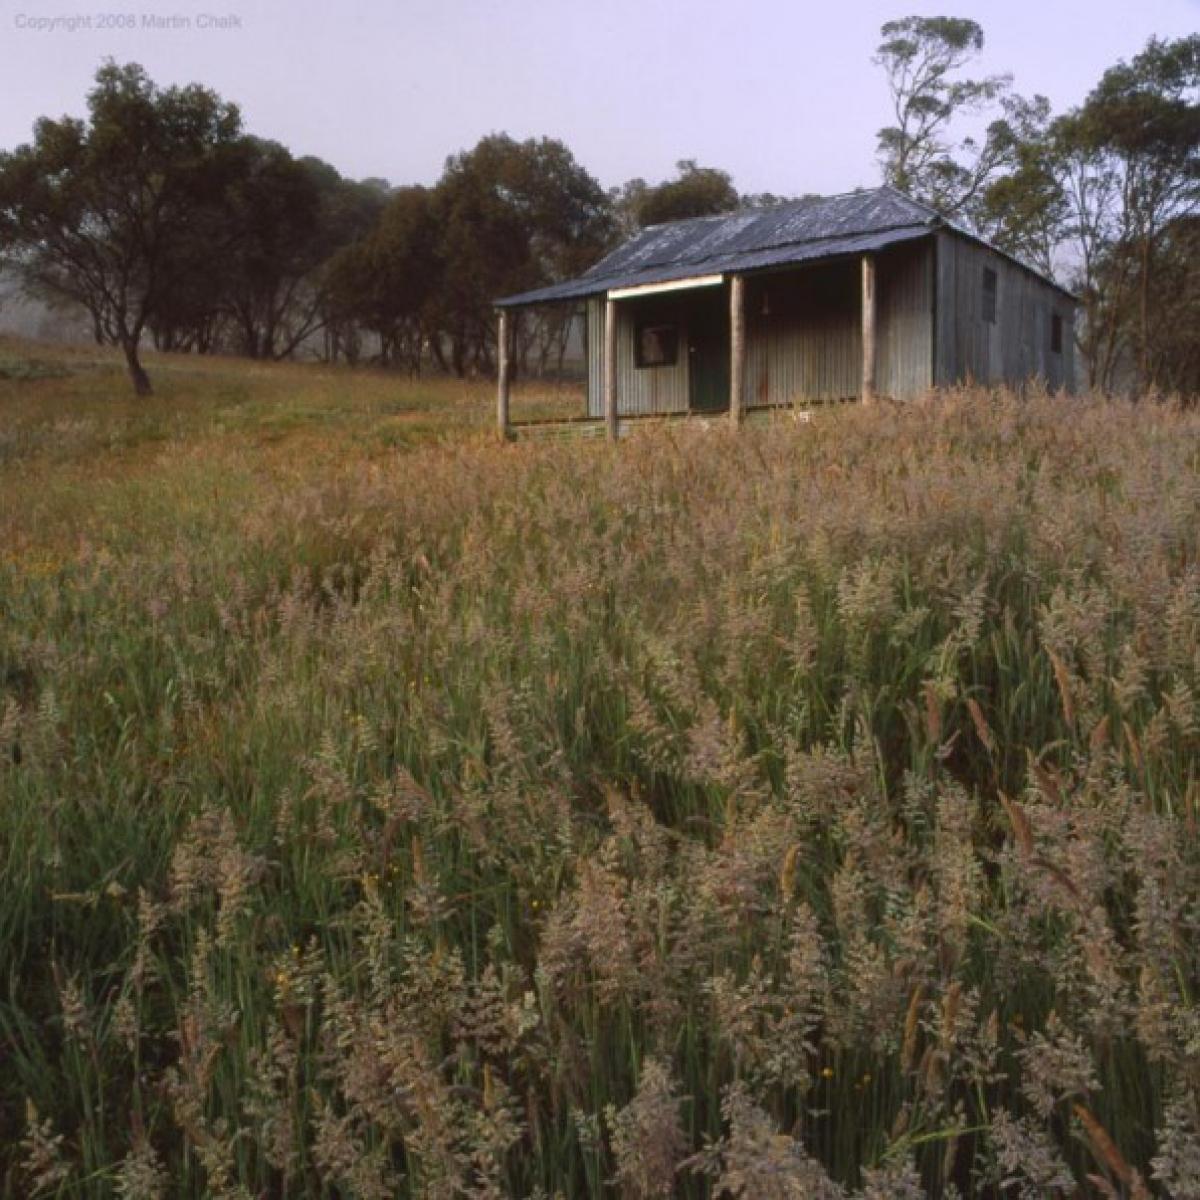 Dawn at Townsend's Hut